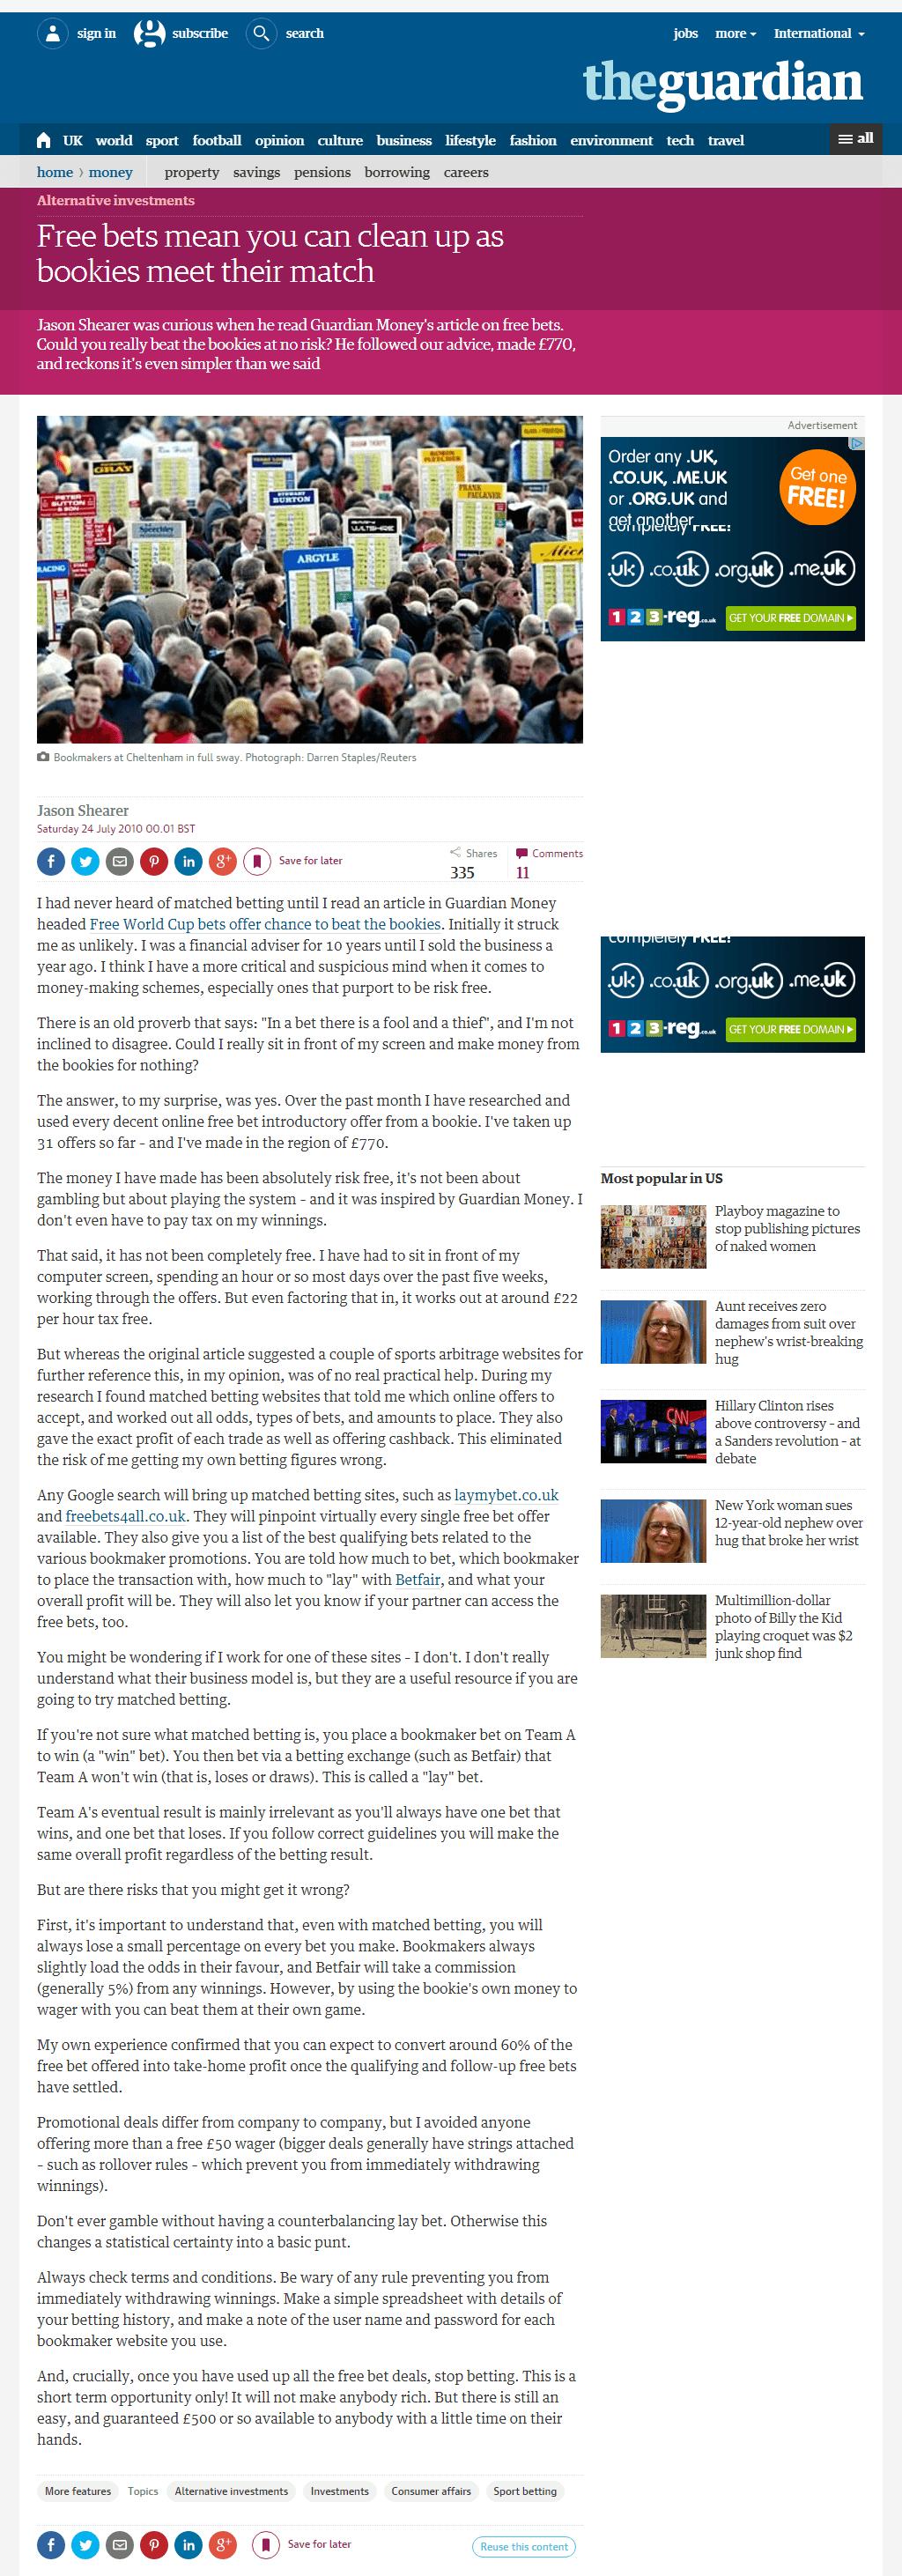 Guardian Full Article